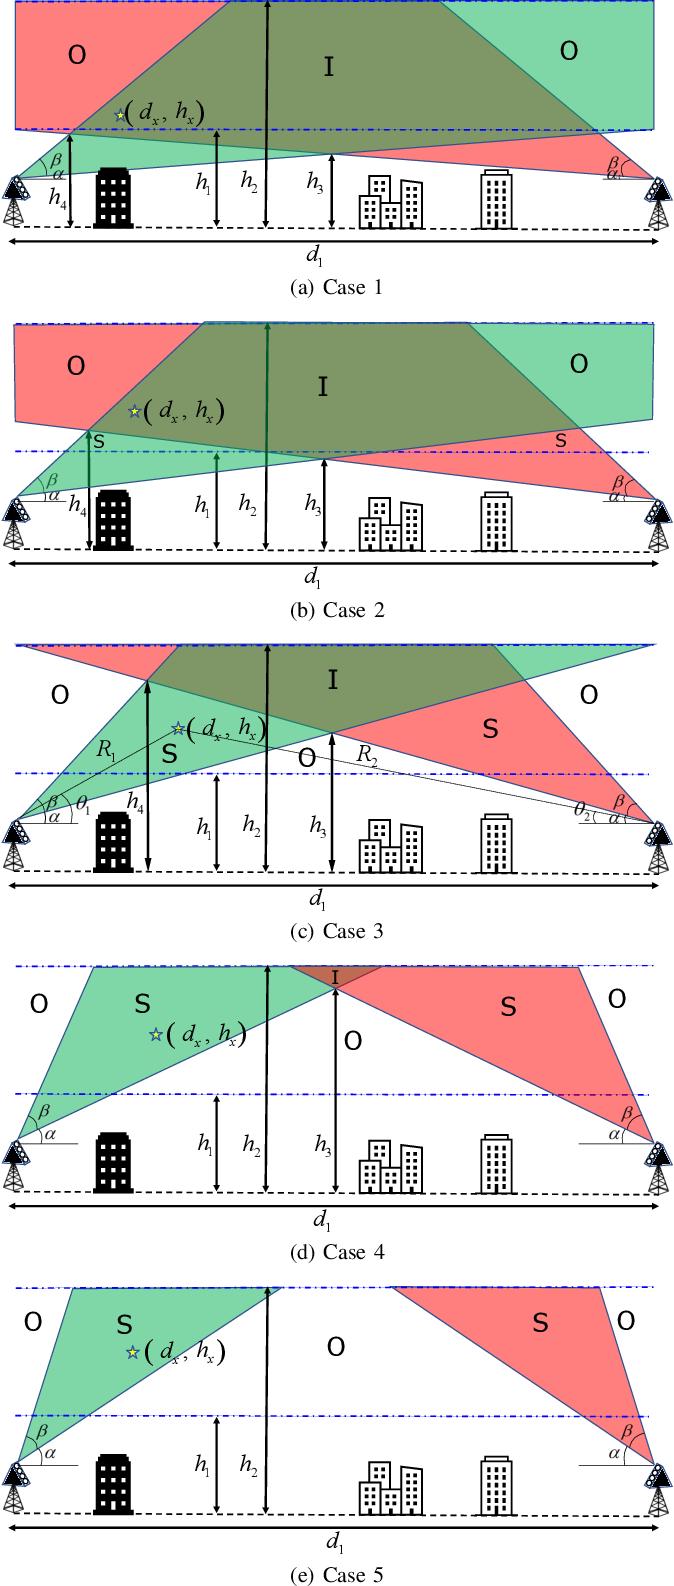 Figure 1 for Base Station Antenna Uptilt Optimization for Cellular-Connected Drone Corridors